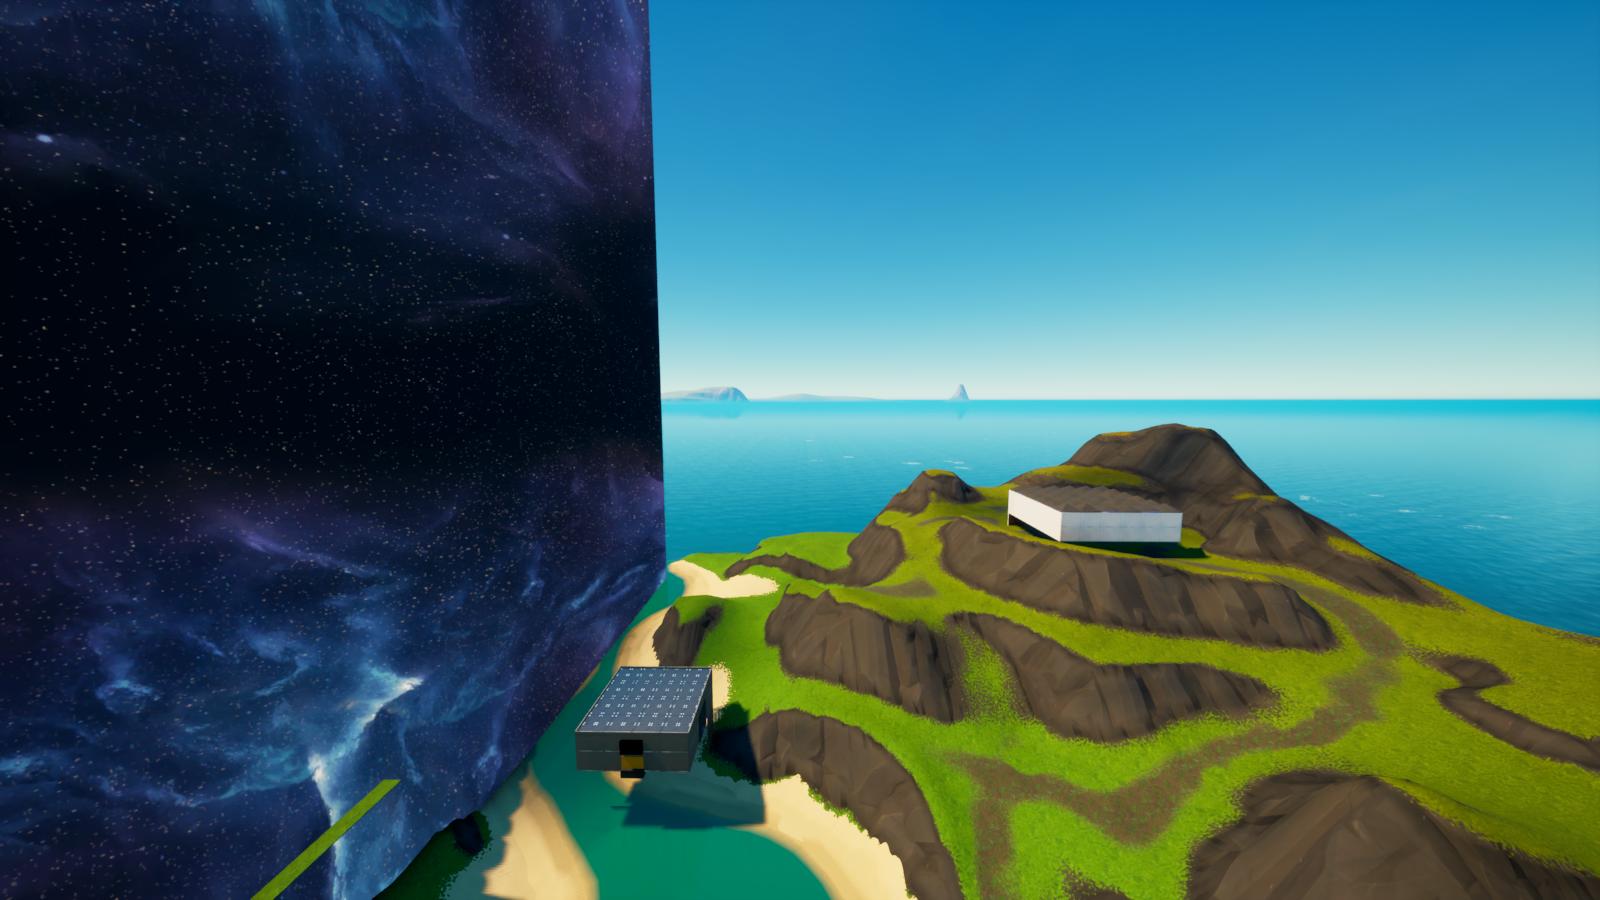 》 SEASON 7 《…BOX PVP & ZONE WARS 9228-8994-1362 by boykaaro